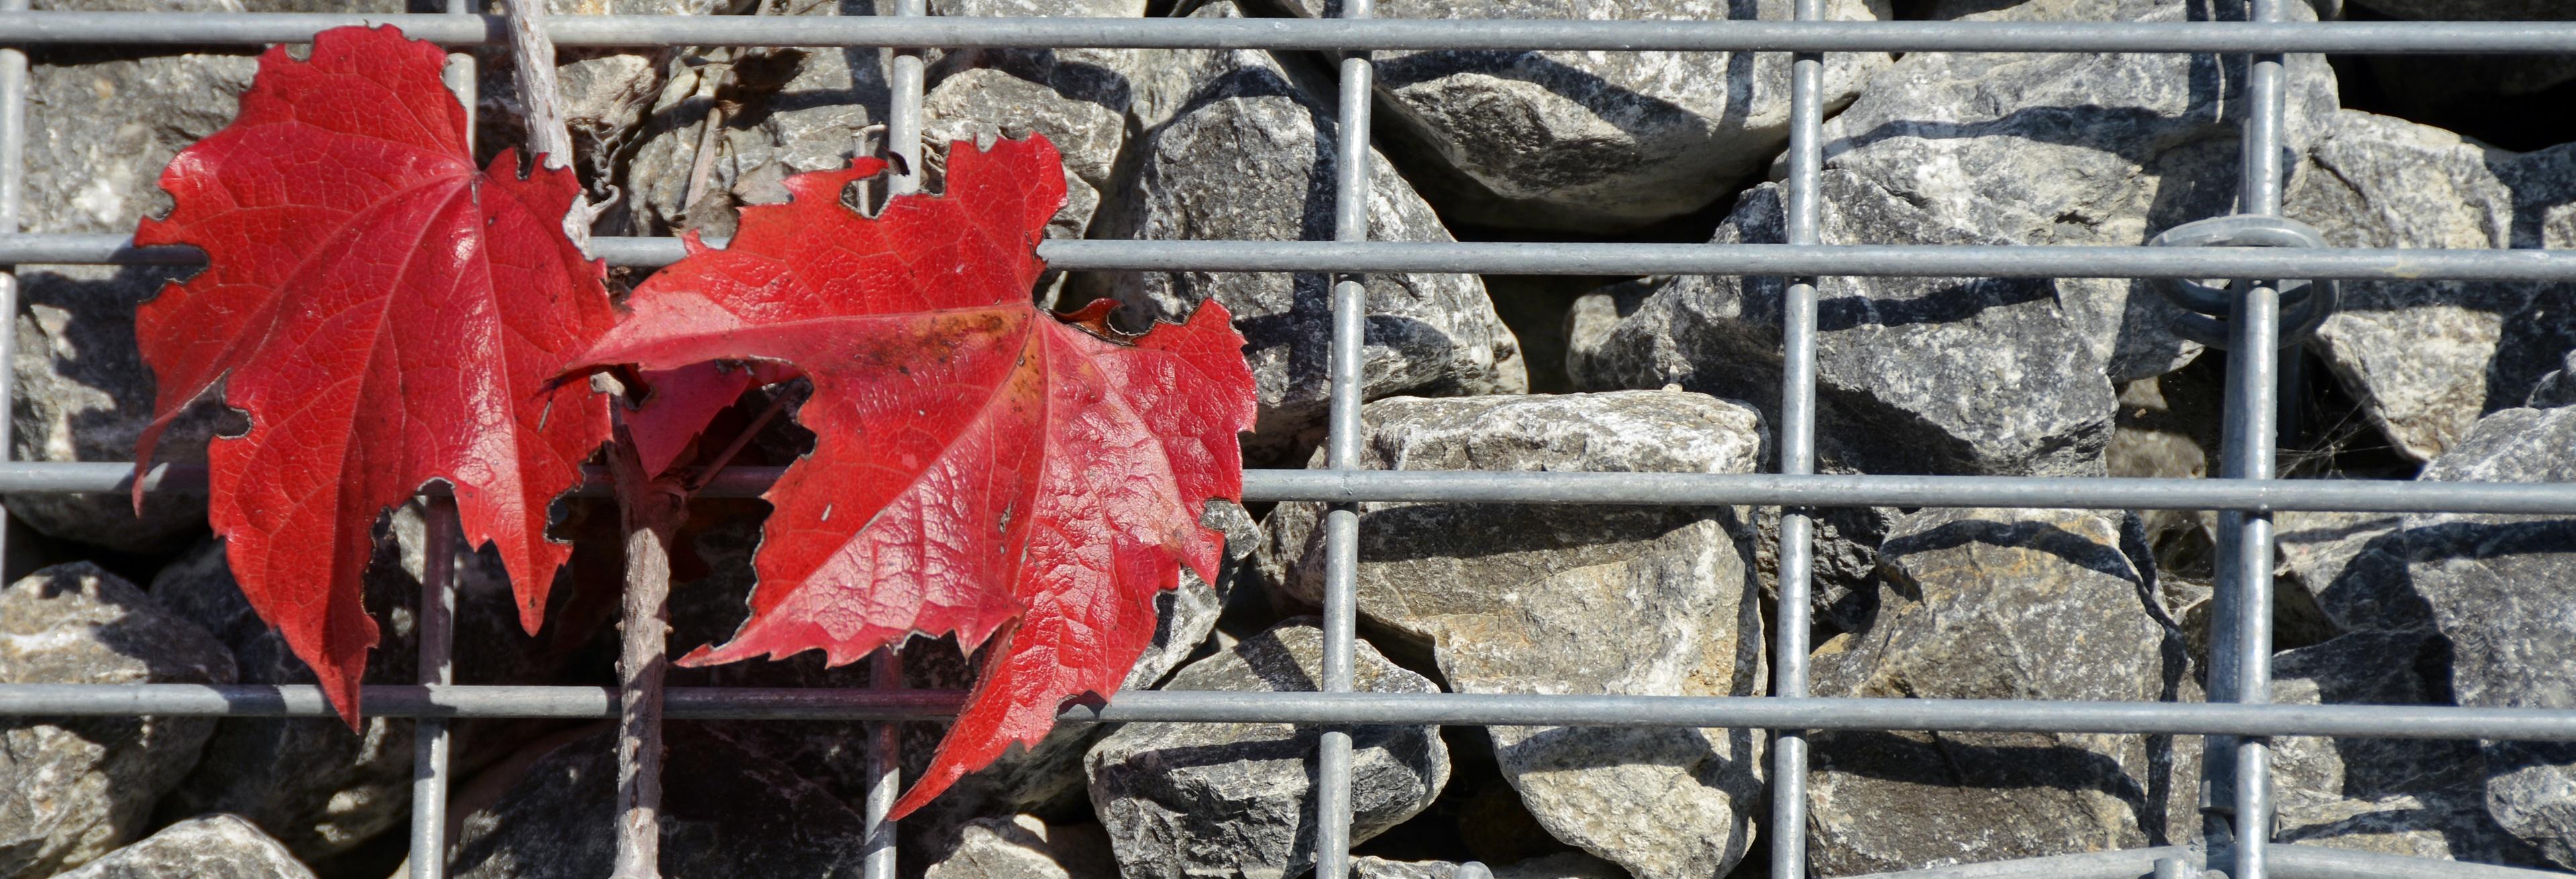 Fotoğraf Doğa Bitki Gıda Kırmızı Afiş Dağcı Taş Duvar